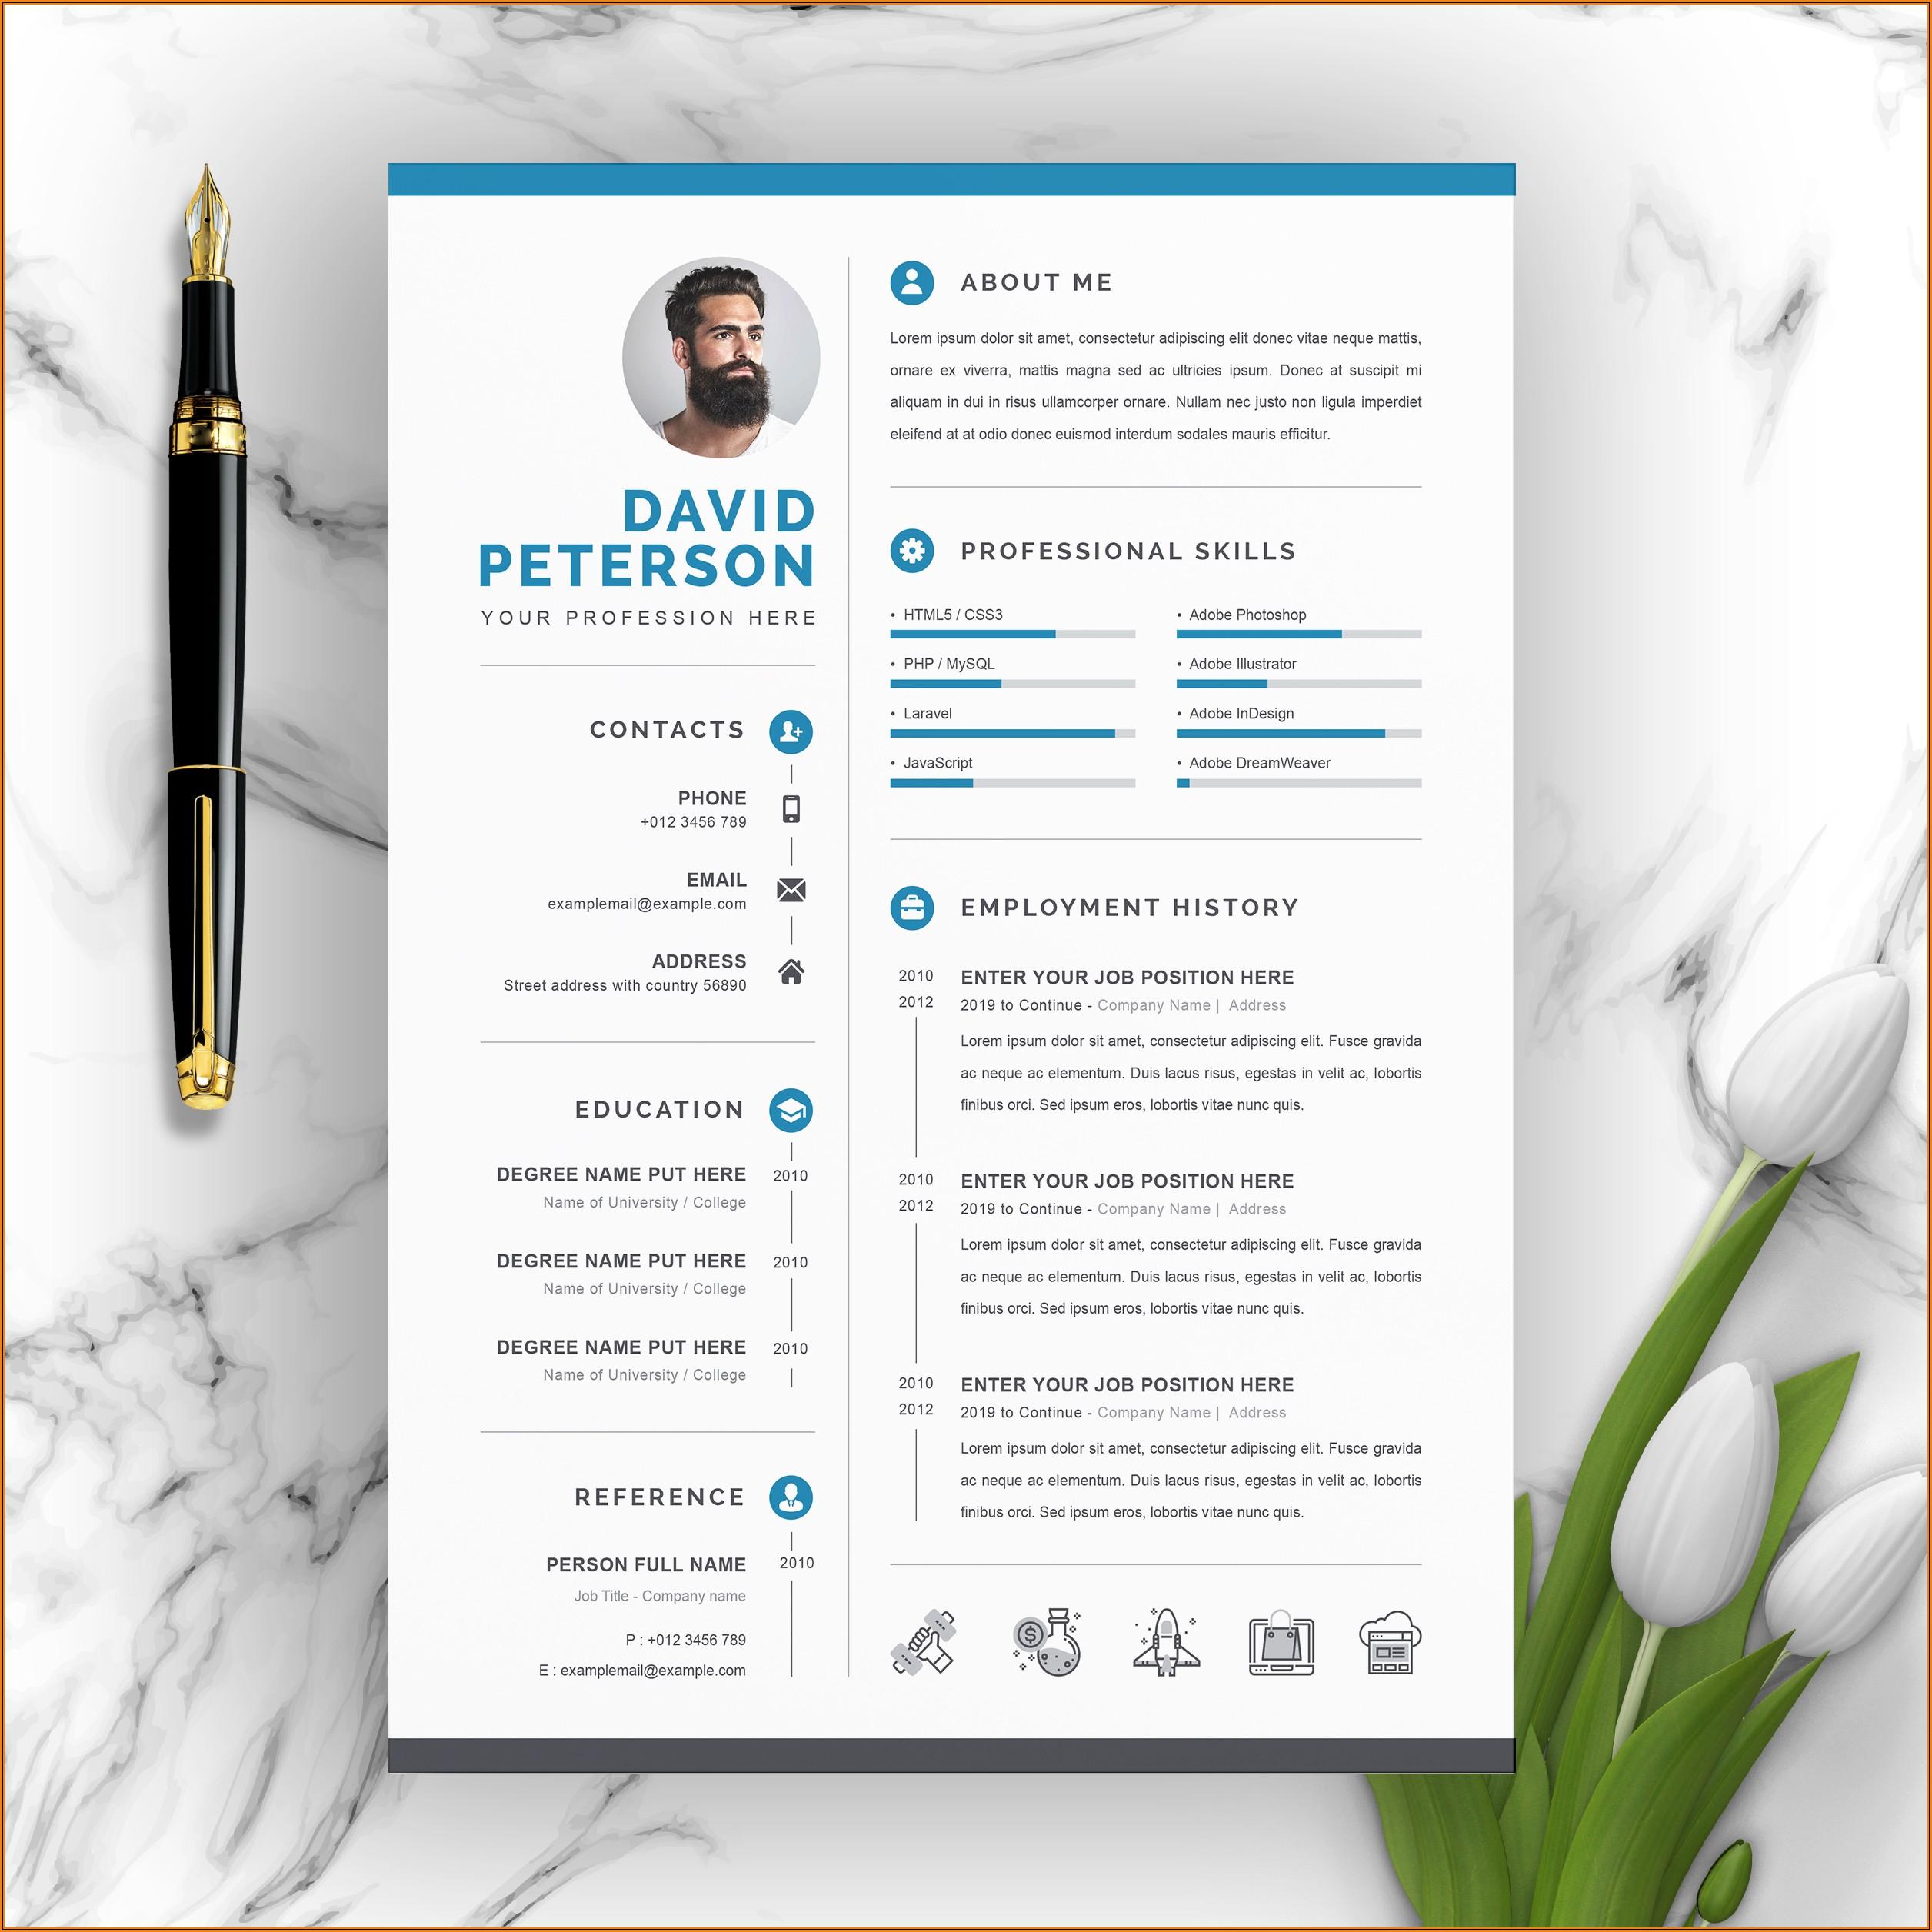 Download Template Cv Microsoft Word 2010